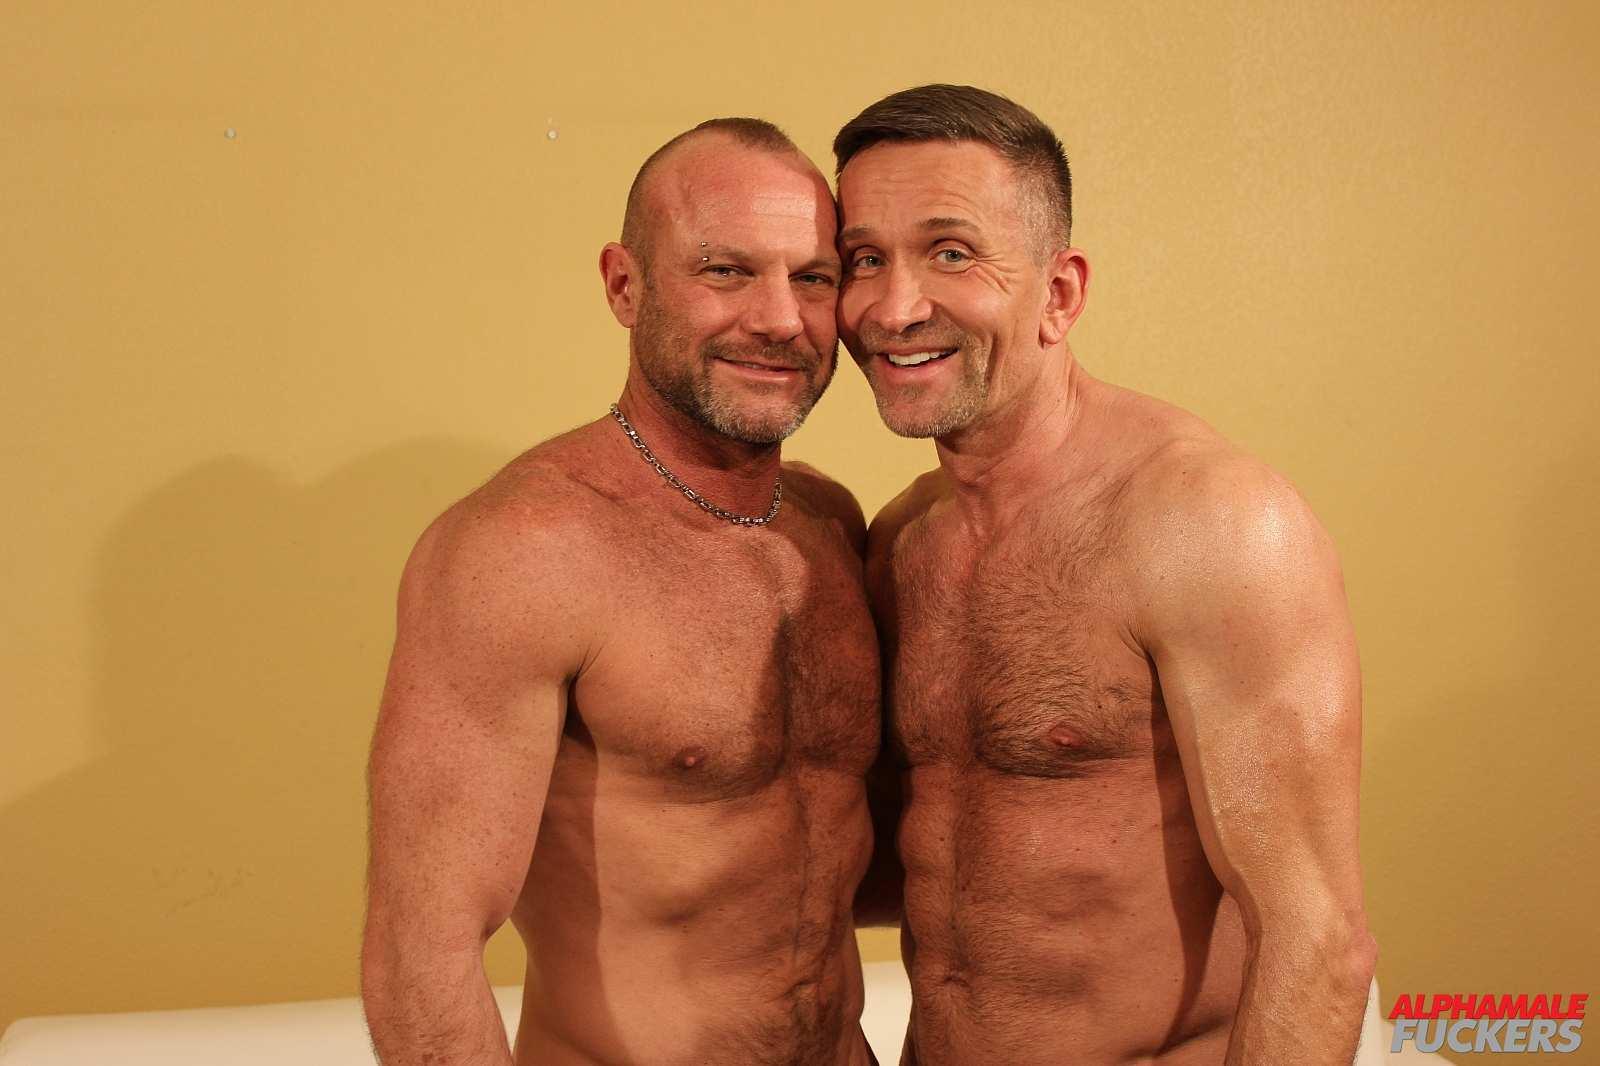 AM_Chad_Brock_and_Matt_Sizemore_1080p_s1.jpg